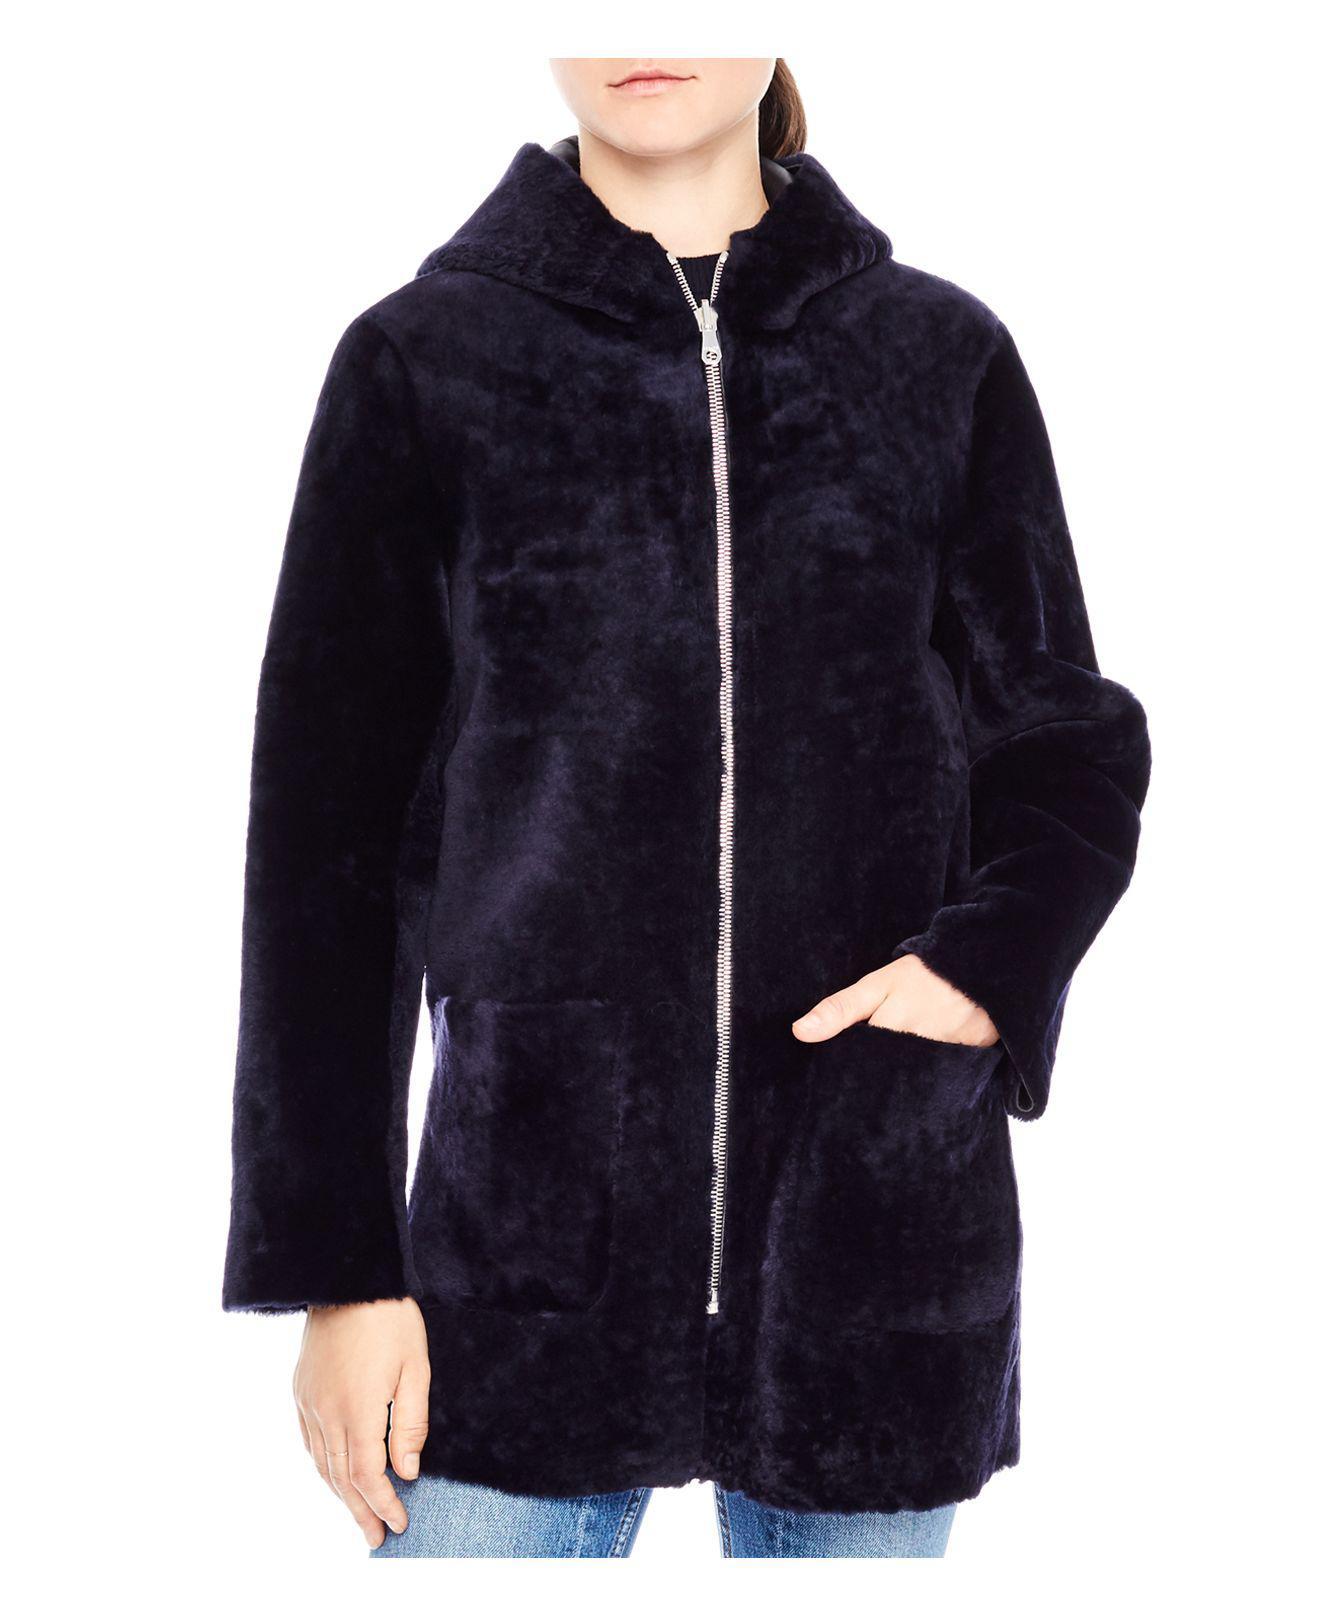 Sandro Penny Shearling Hooded Coat In Navy Blue (Blue)